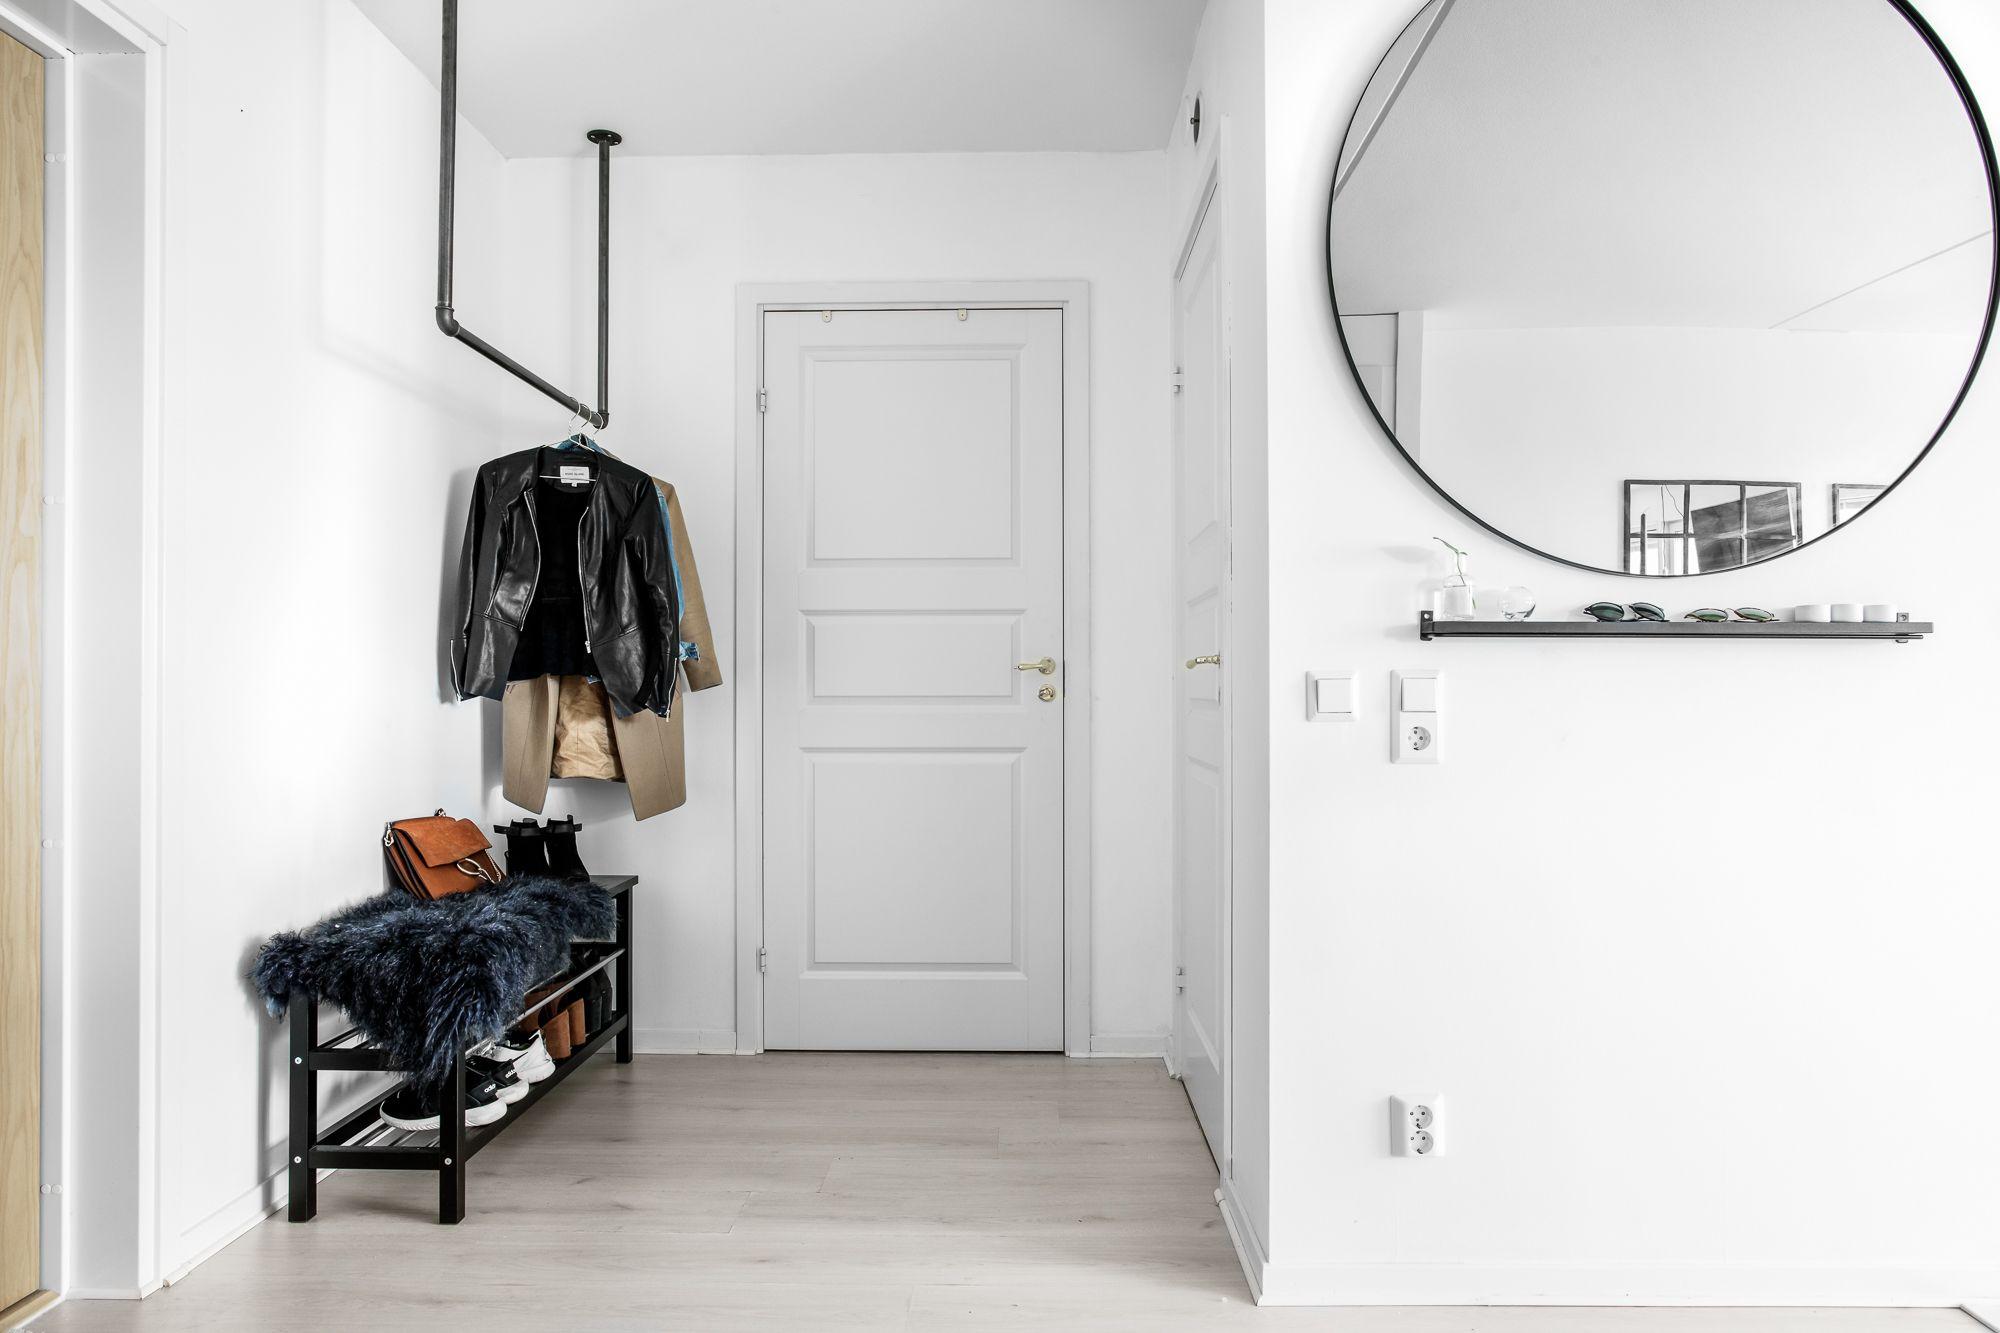 spiegel-in-de-woonkamer-9.jpg (2000×1333) | Hal couperinstraat ...